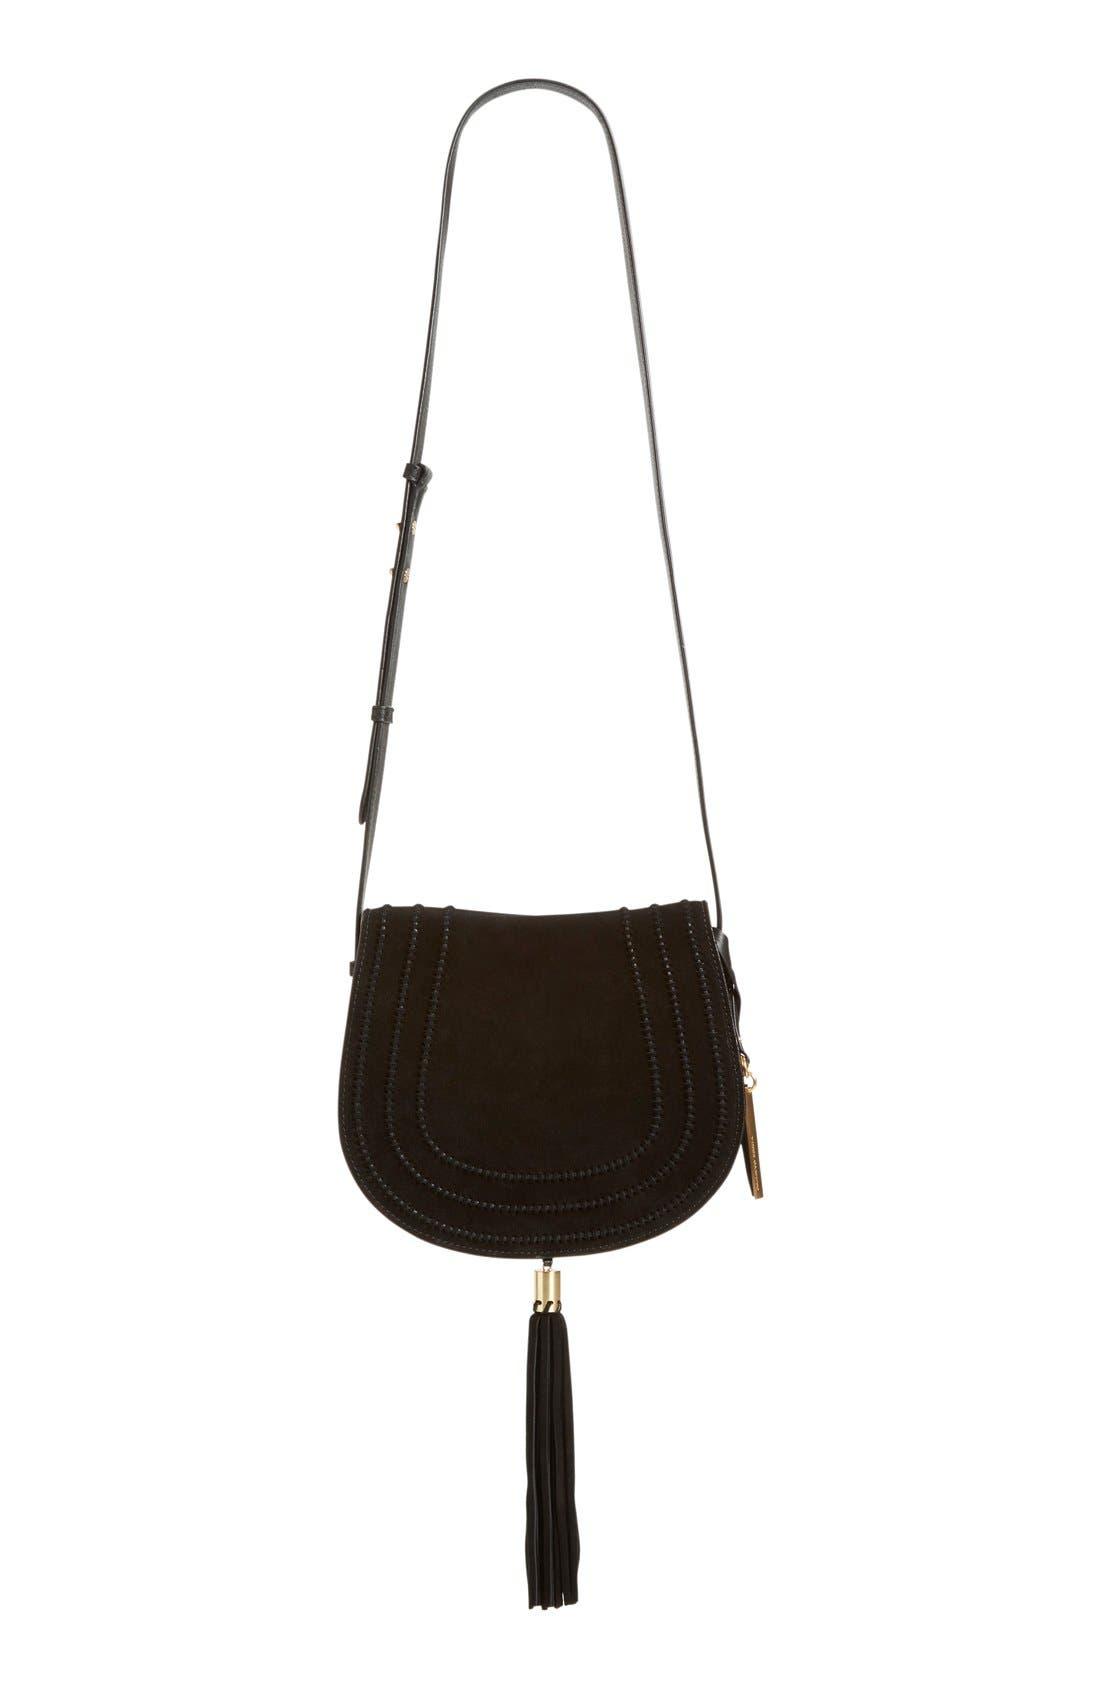 VINCE CAMUTO, 'Izzi' Tassel Leather & Suede Crossbody Bag, Alternate thumbnail 3, color, 001